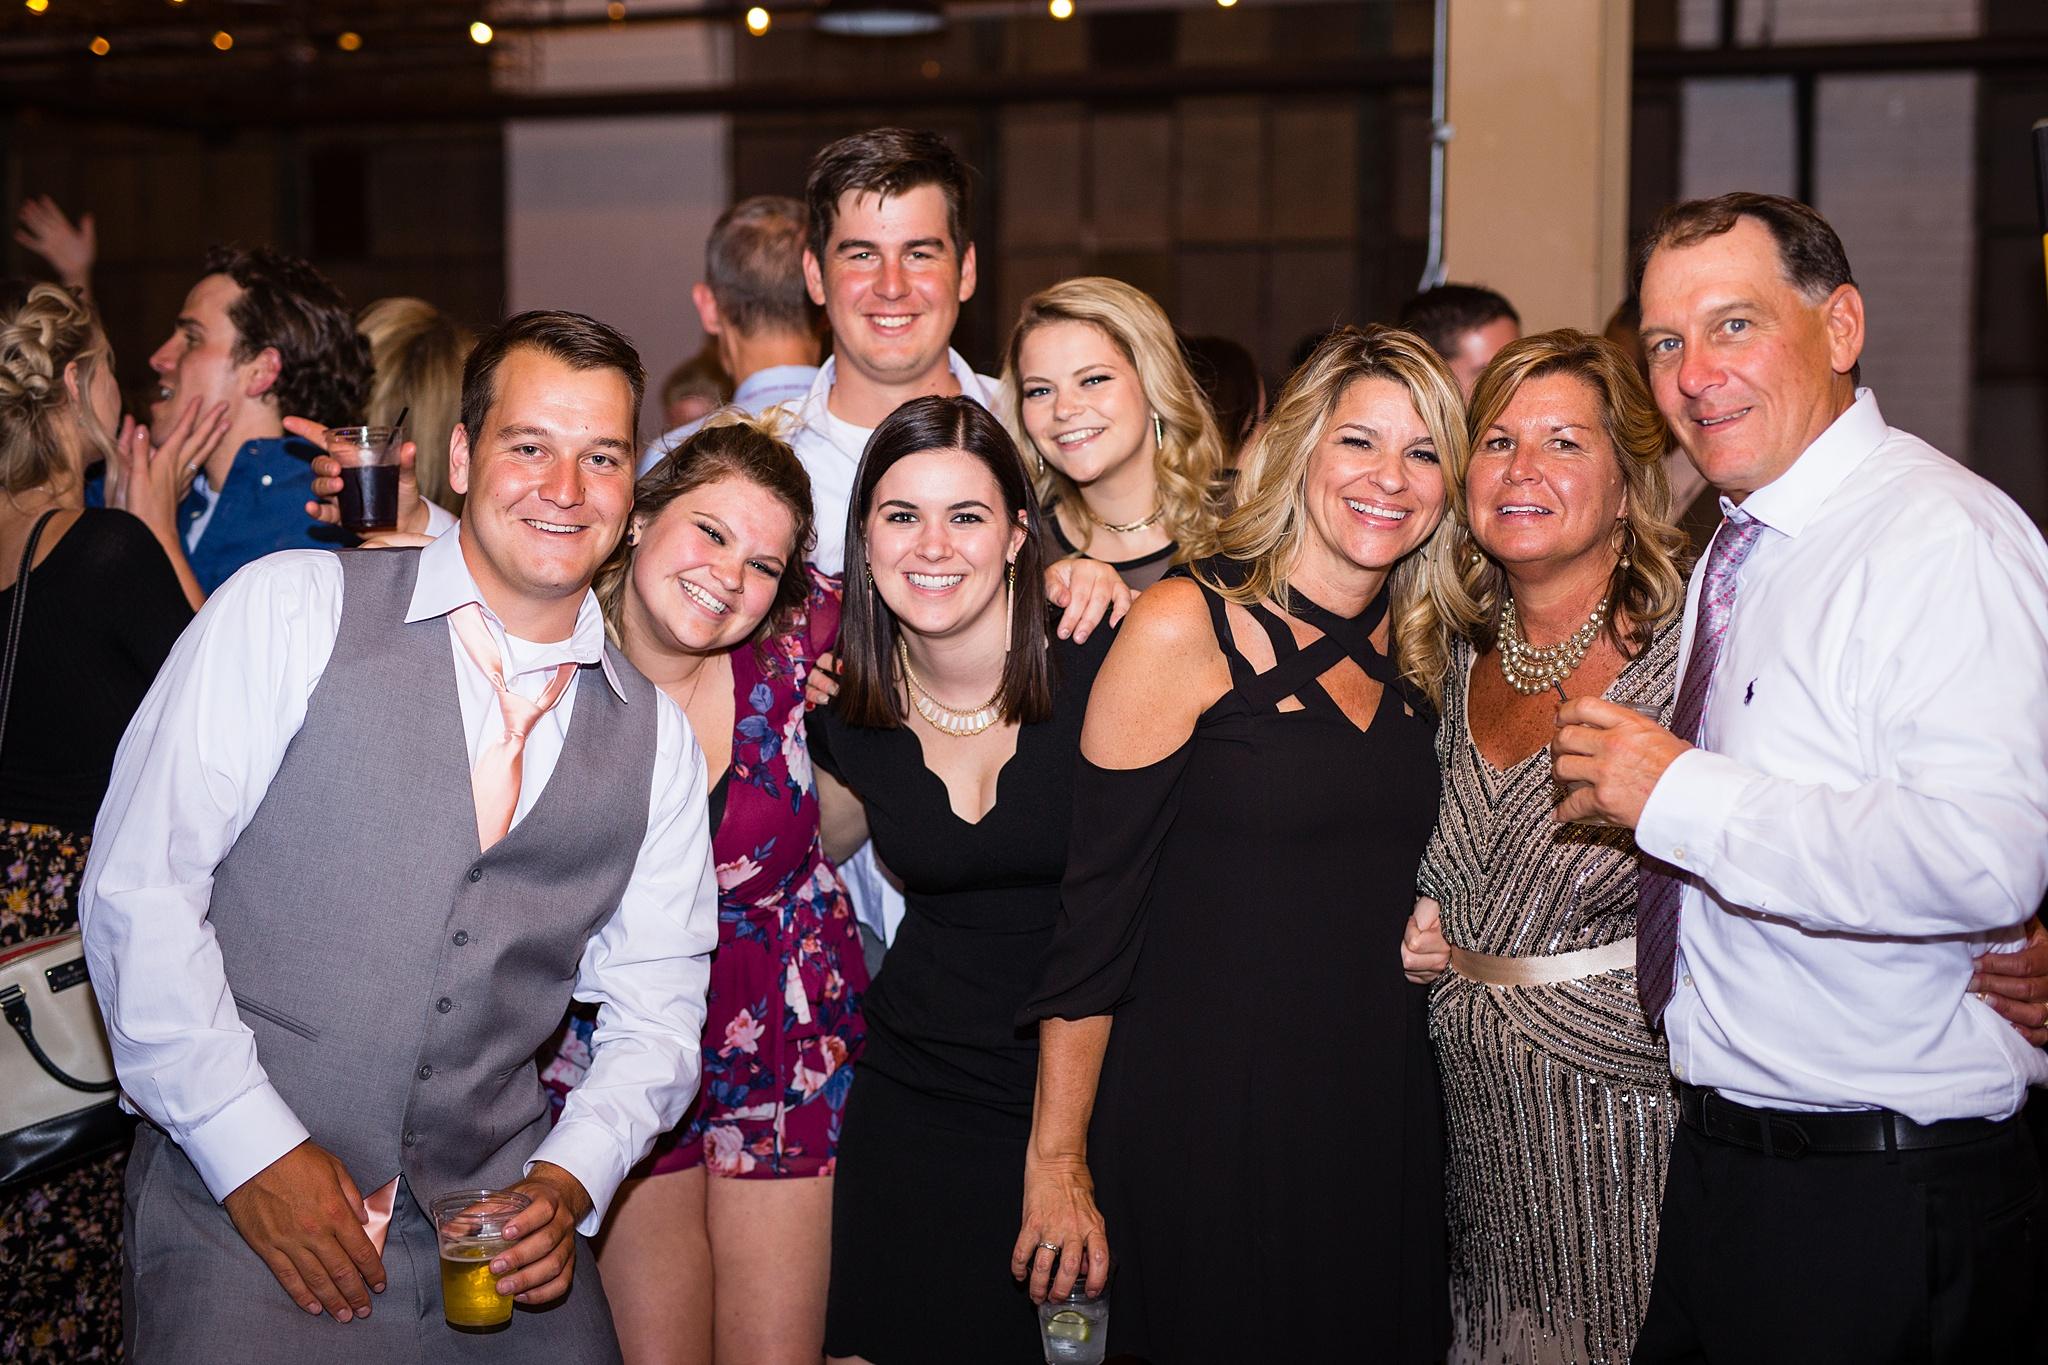 Meghan_Drew_Grand_Rapids_Cheney_place_Wedding100.JPG